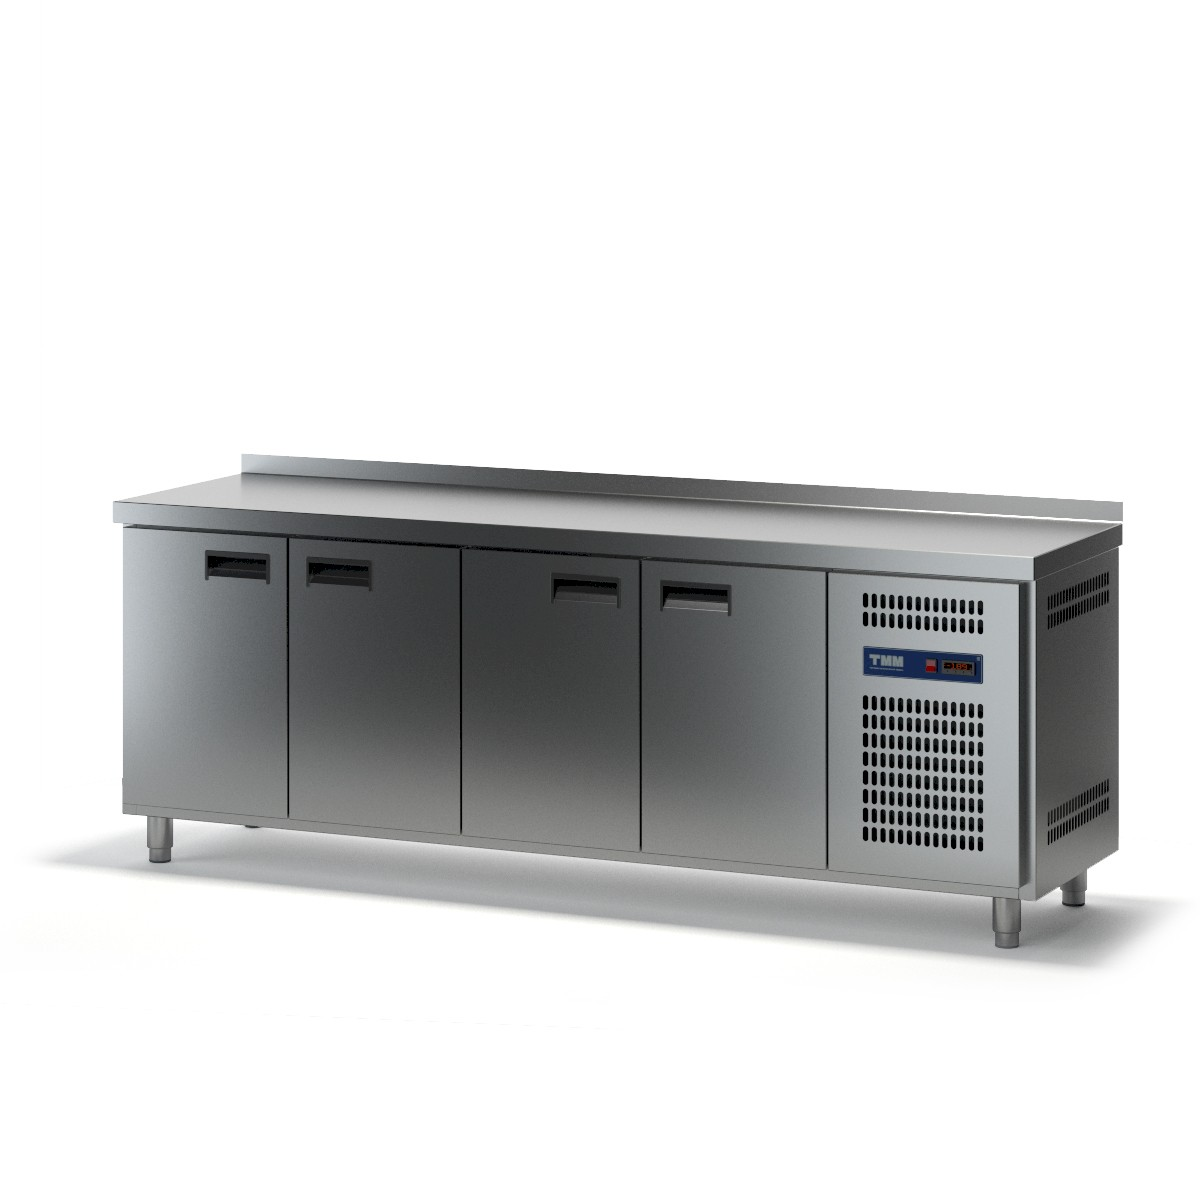 Стол холодильный четырехдверный СХСБ-1/4Д 2280х700